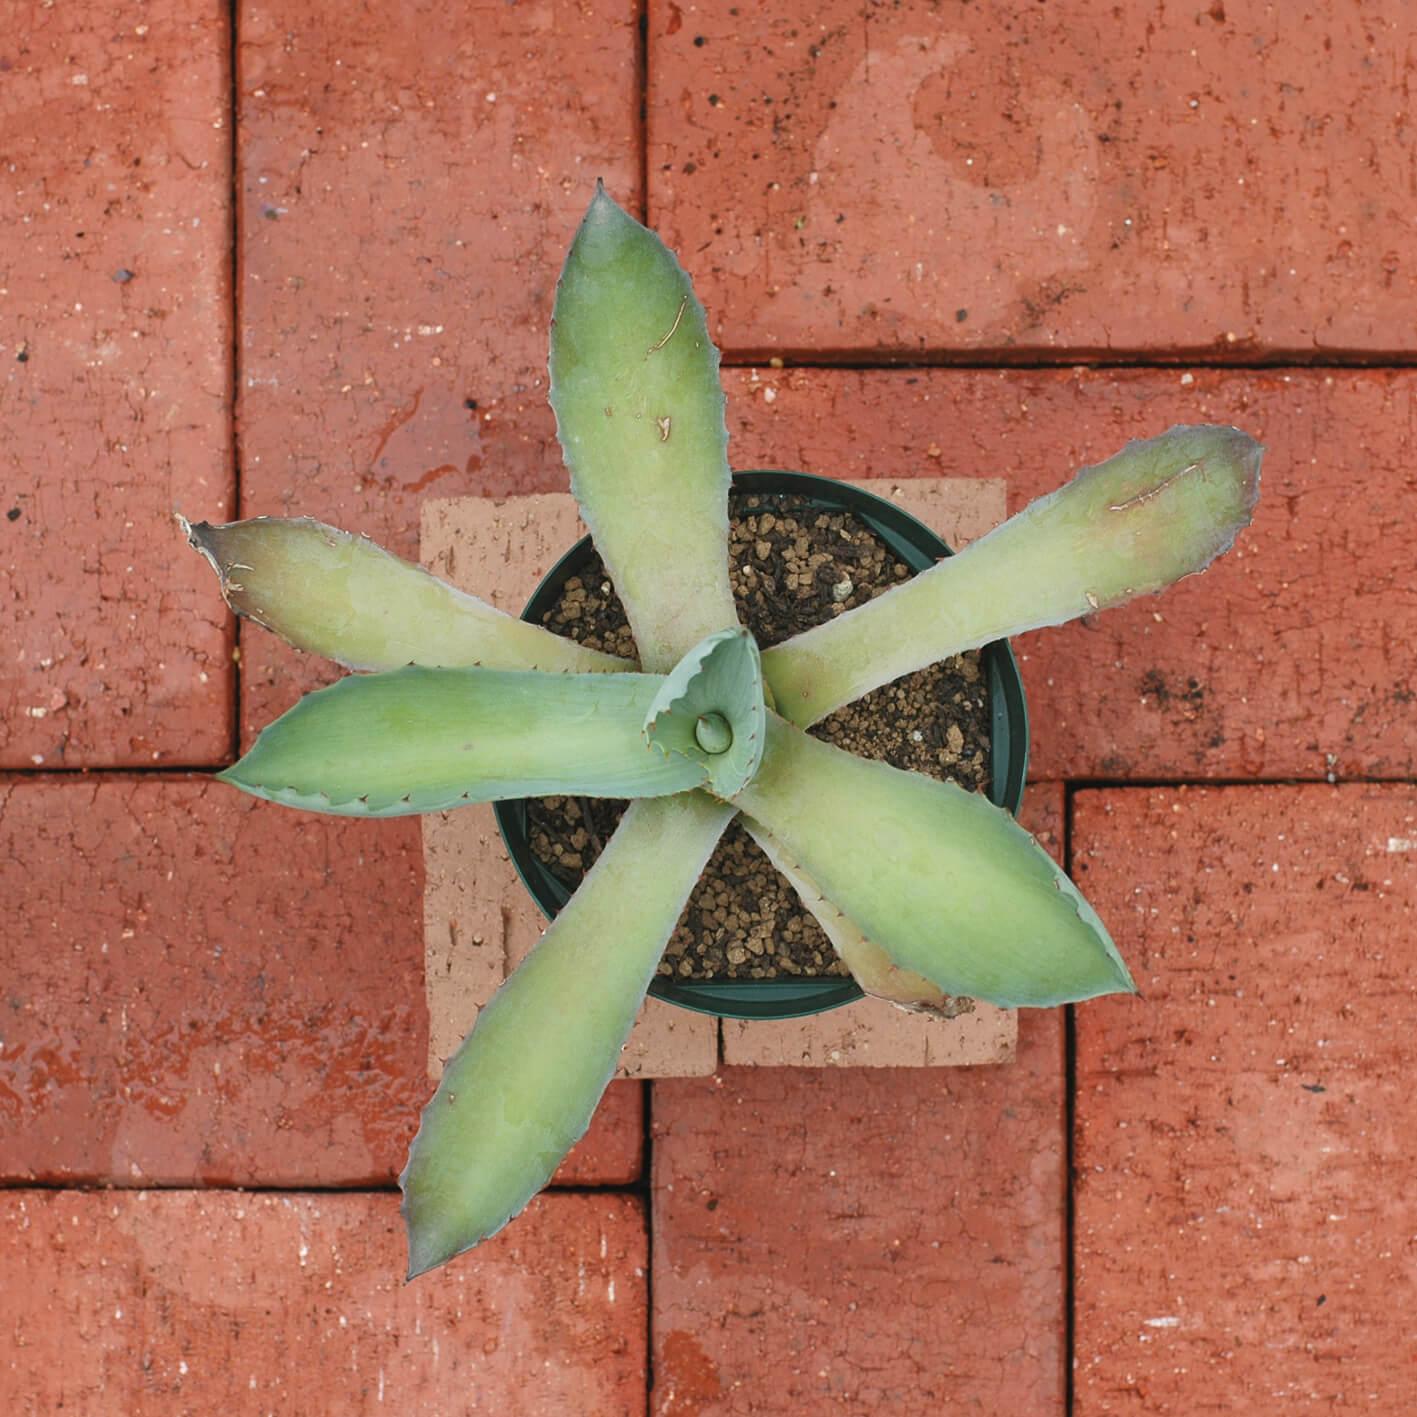 agave-seemanniana-may-2020-2.jpg